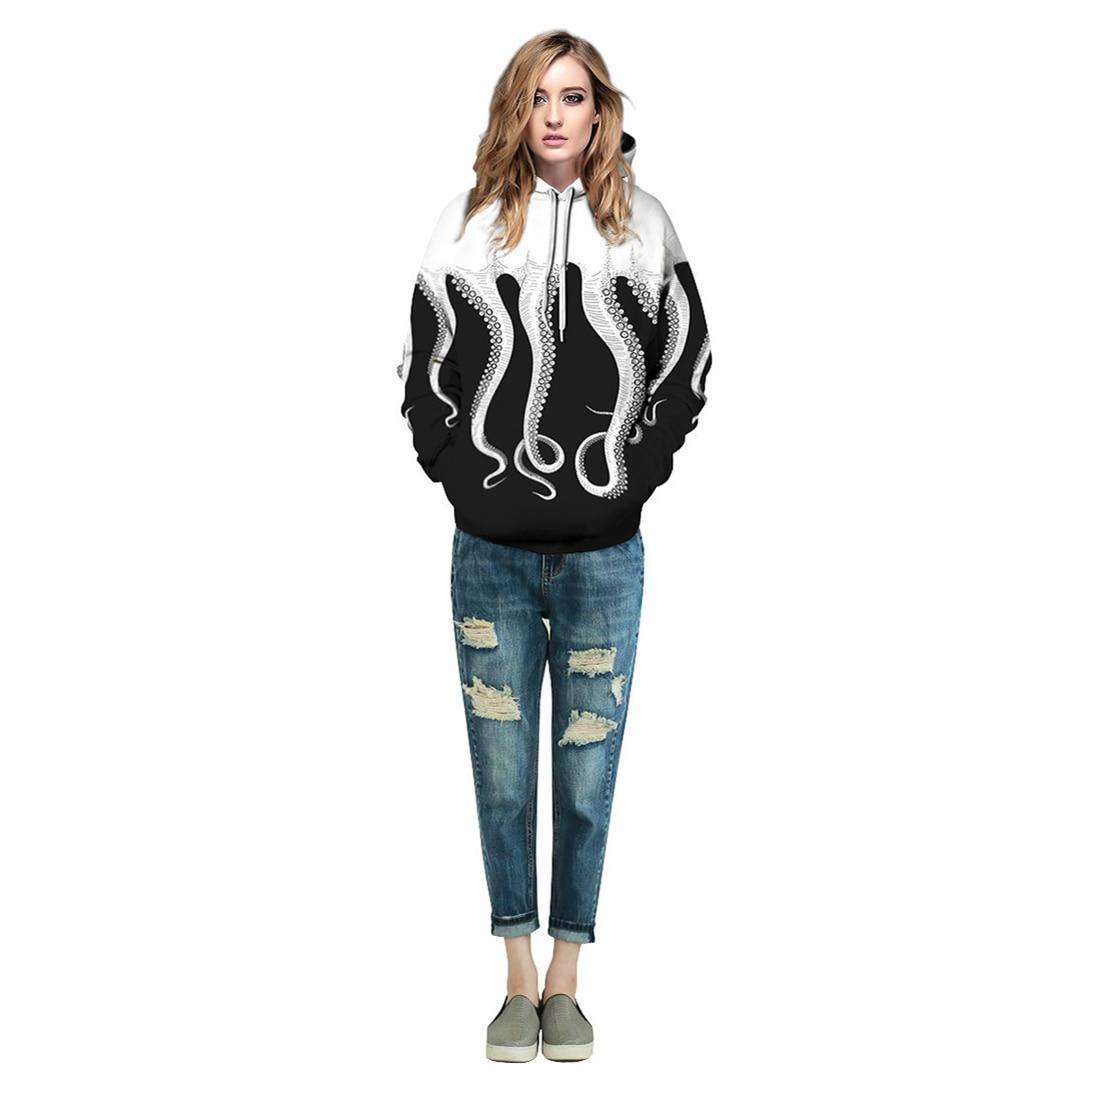 Men/Women New Hoodies 3d Print Tracksuit Octopus Funny Hoodie Harajuku Hip Hop Sweatshirts Fashion Pullover Hooded Spring